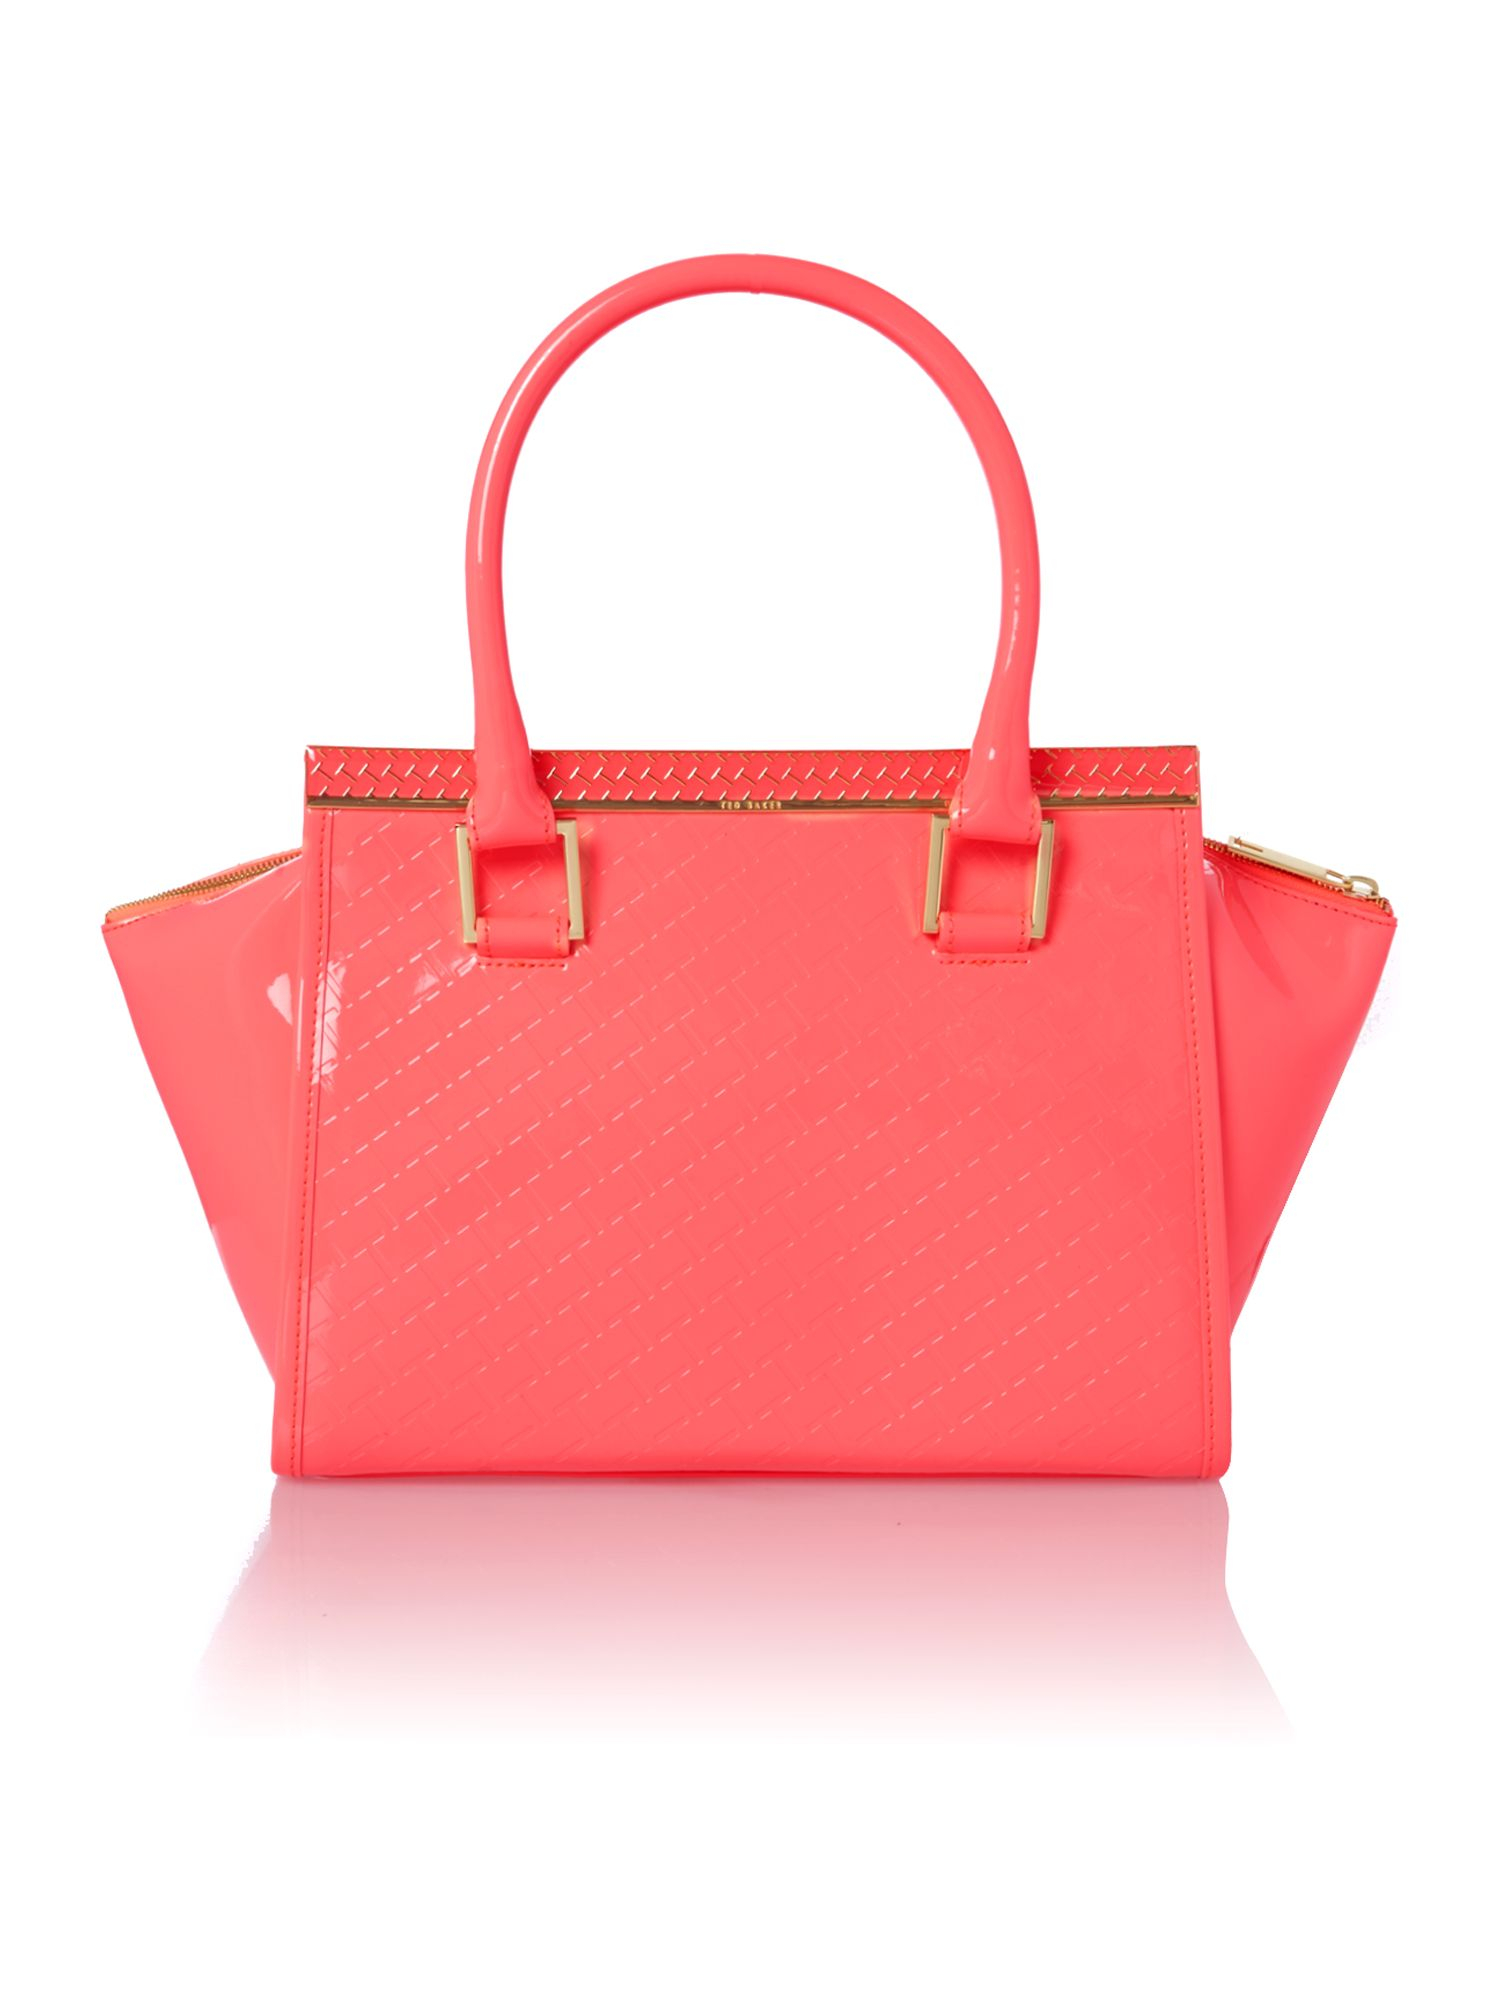 87657eba5ec4f Ted Baker Medium Pink Quilt Tote Bag in Pink